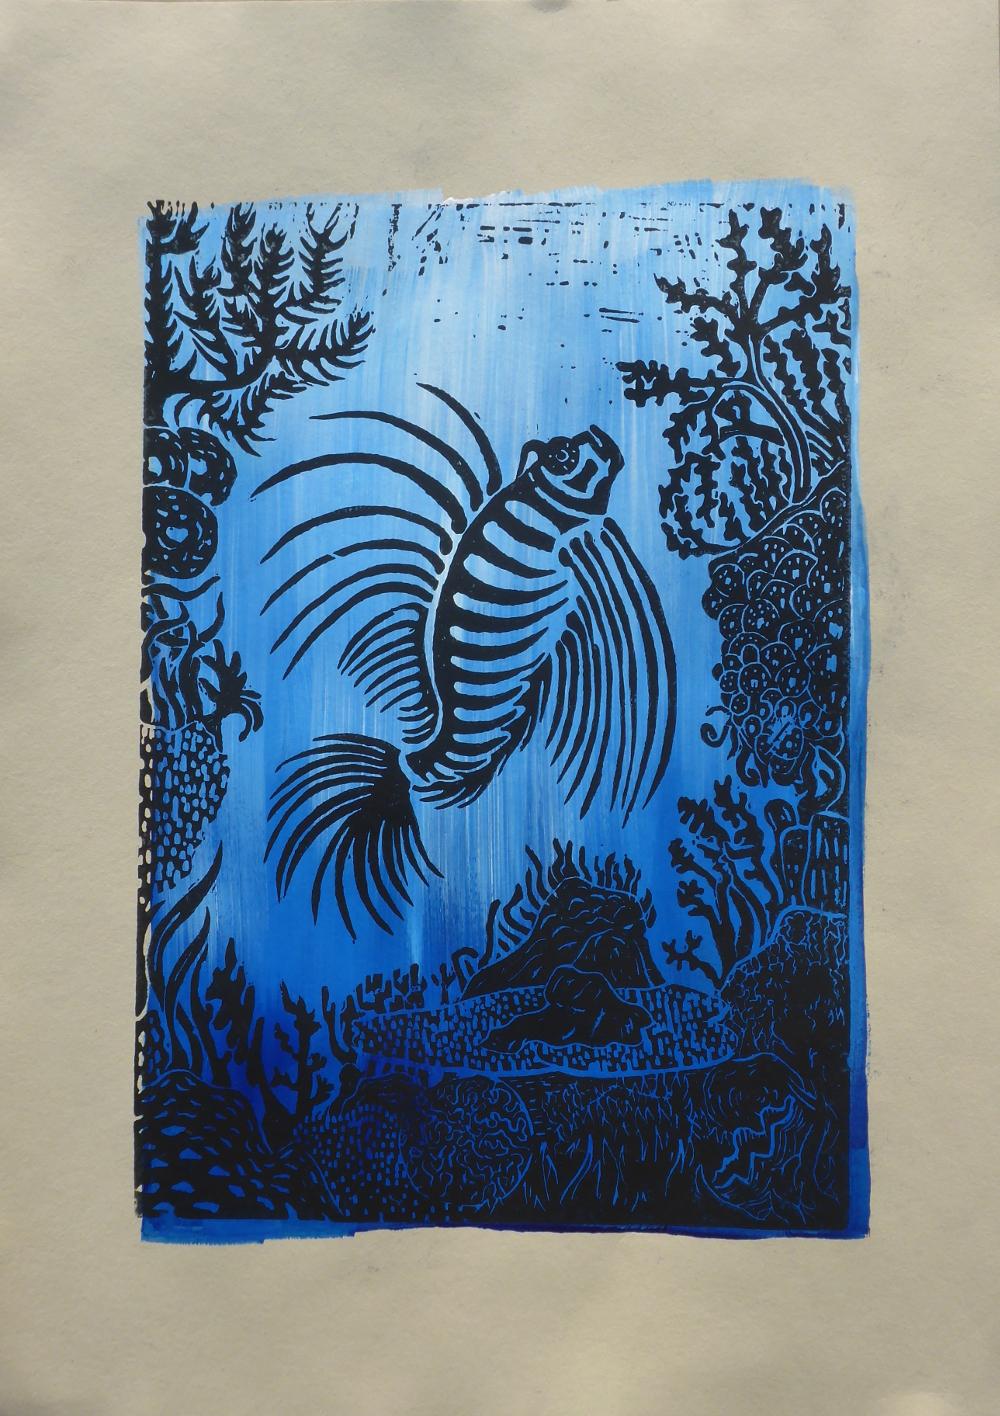 """Das Riff III"", 2019, Linolschnitt + Acryl auf Papier, 30 x 42 cm"